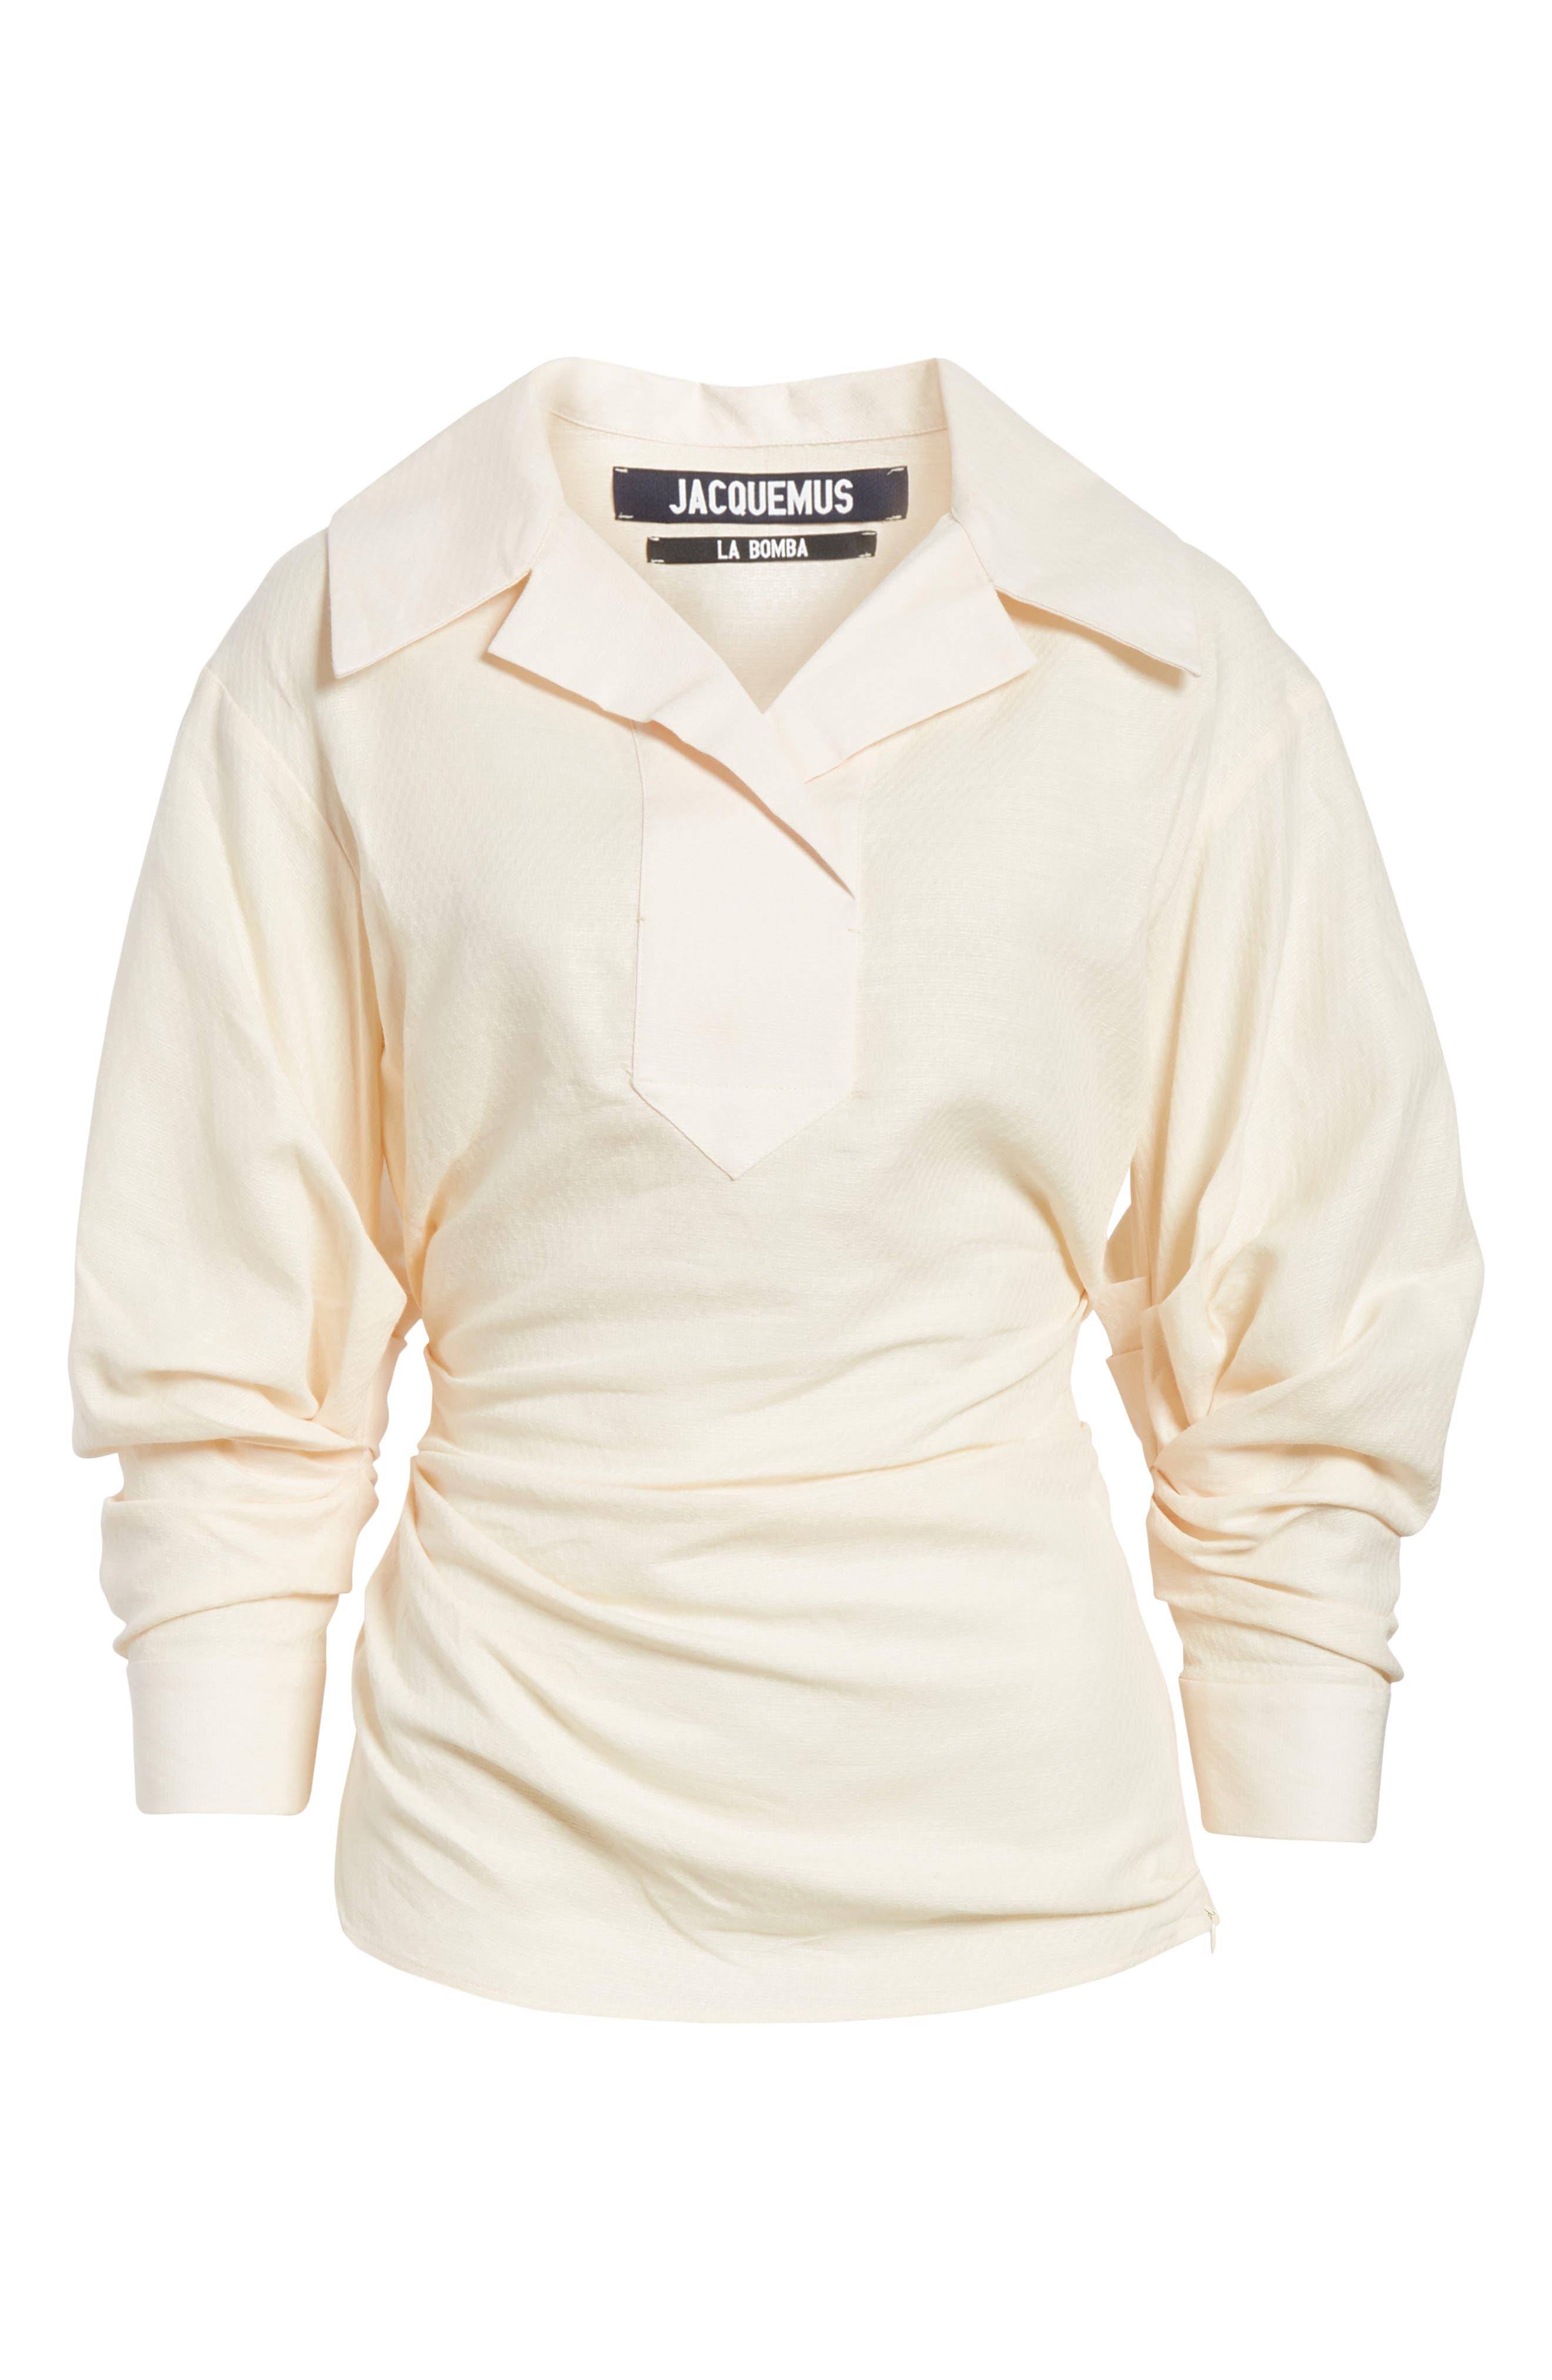 La Chemise Maceio Shirt,                             Alternate thumbnail 6, color,                             250